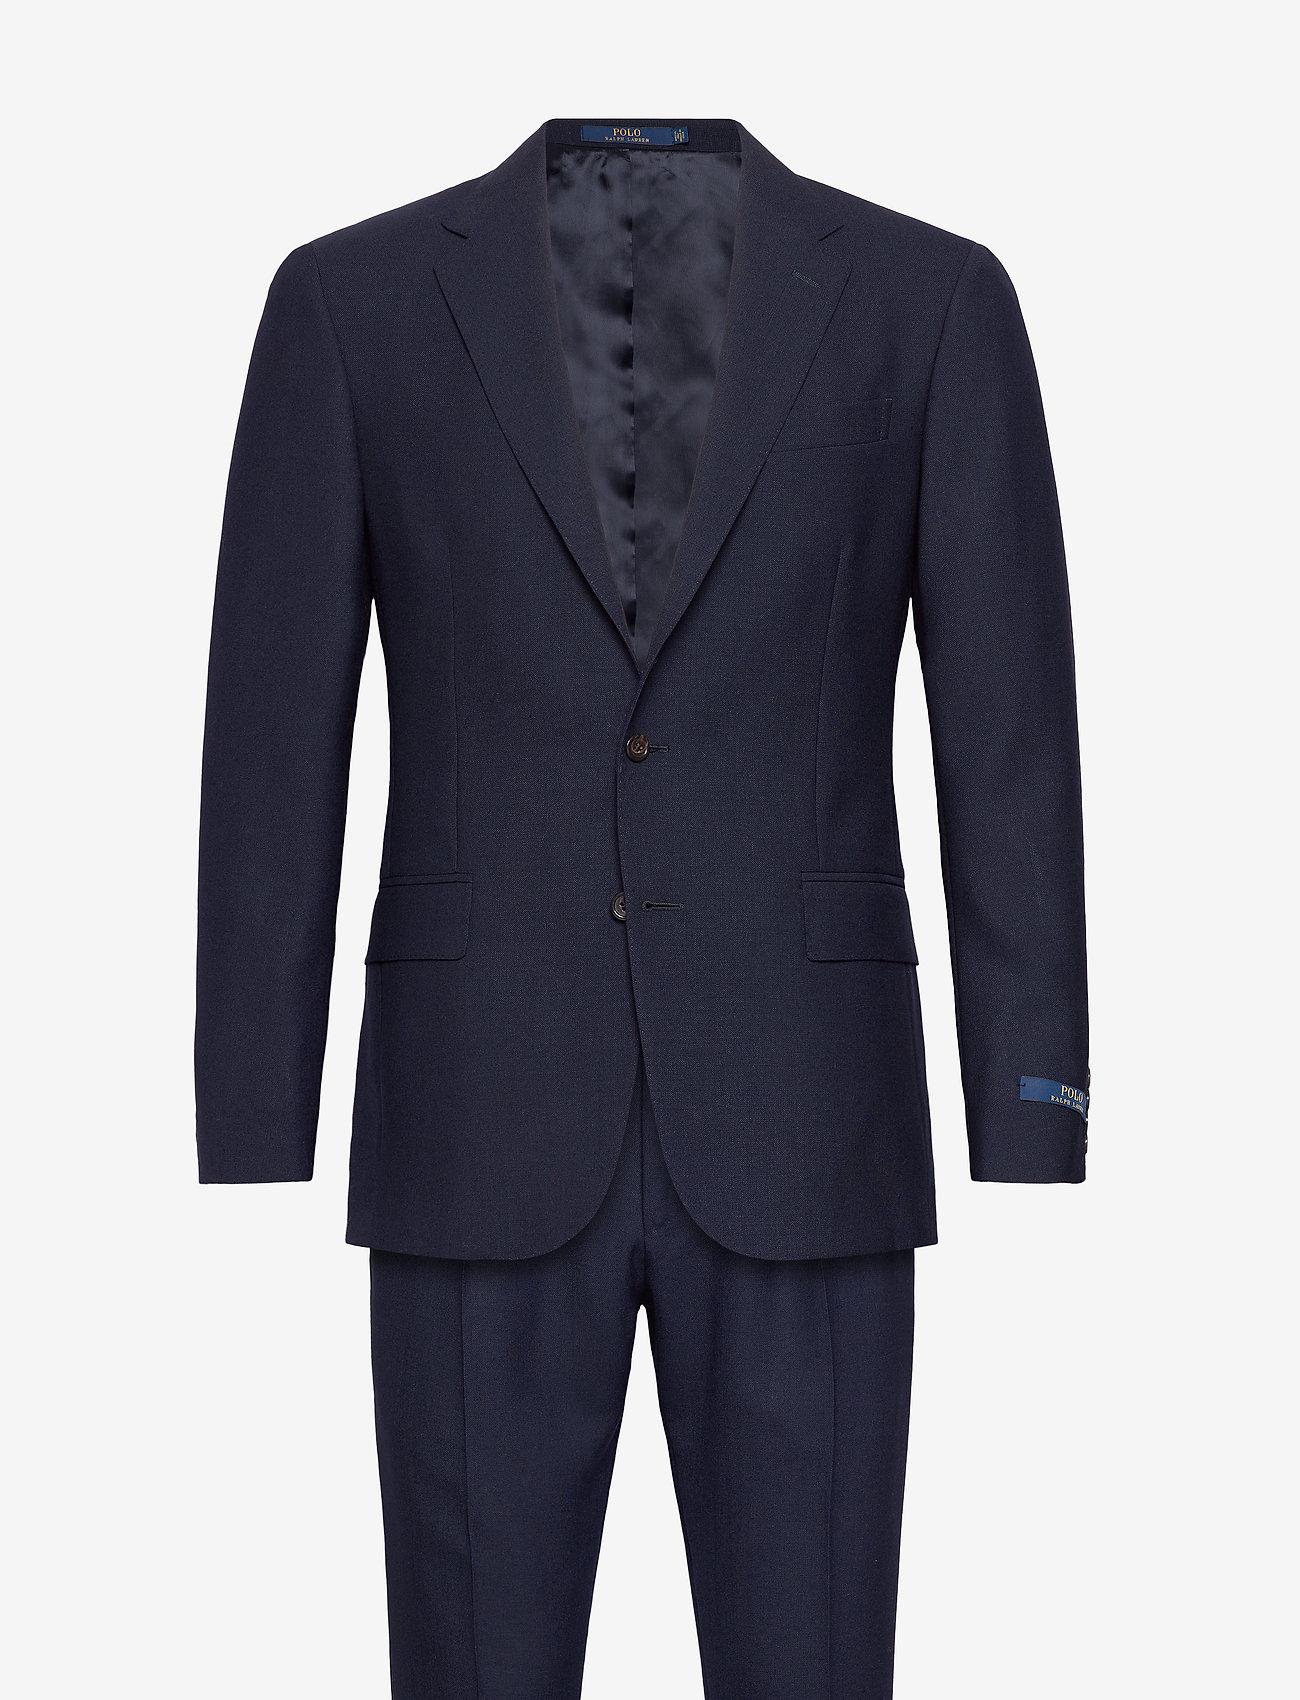 Polo Ralph Lauren - FRESCO-P 2BNT UC DBLE PLT - suits - navy - 0